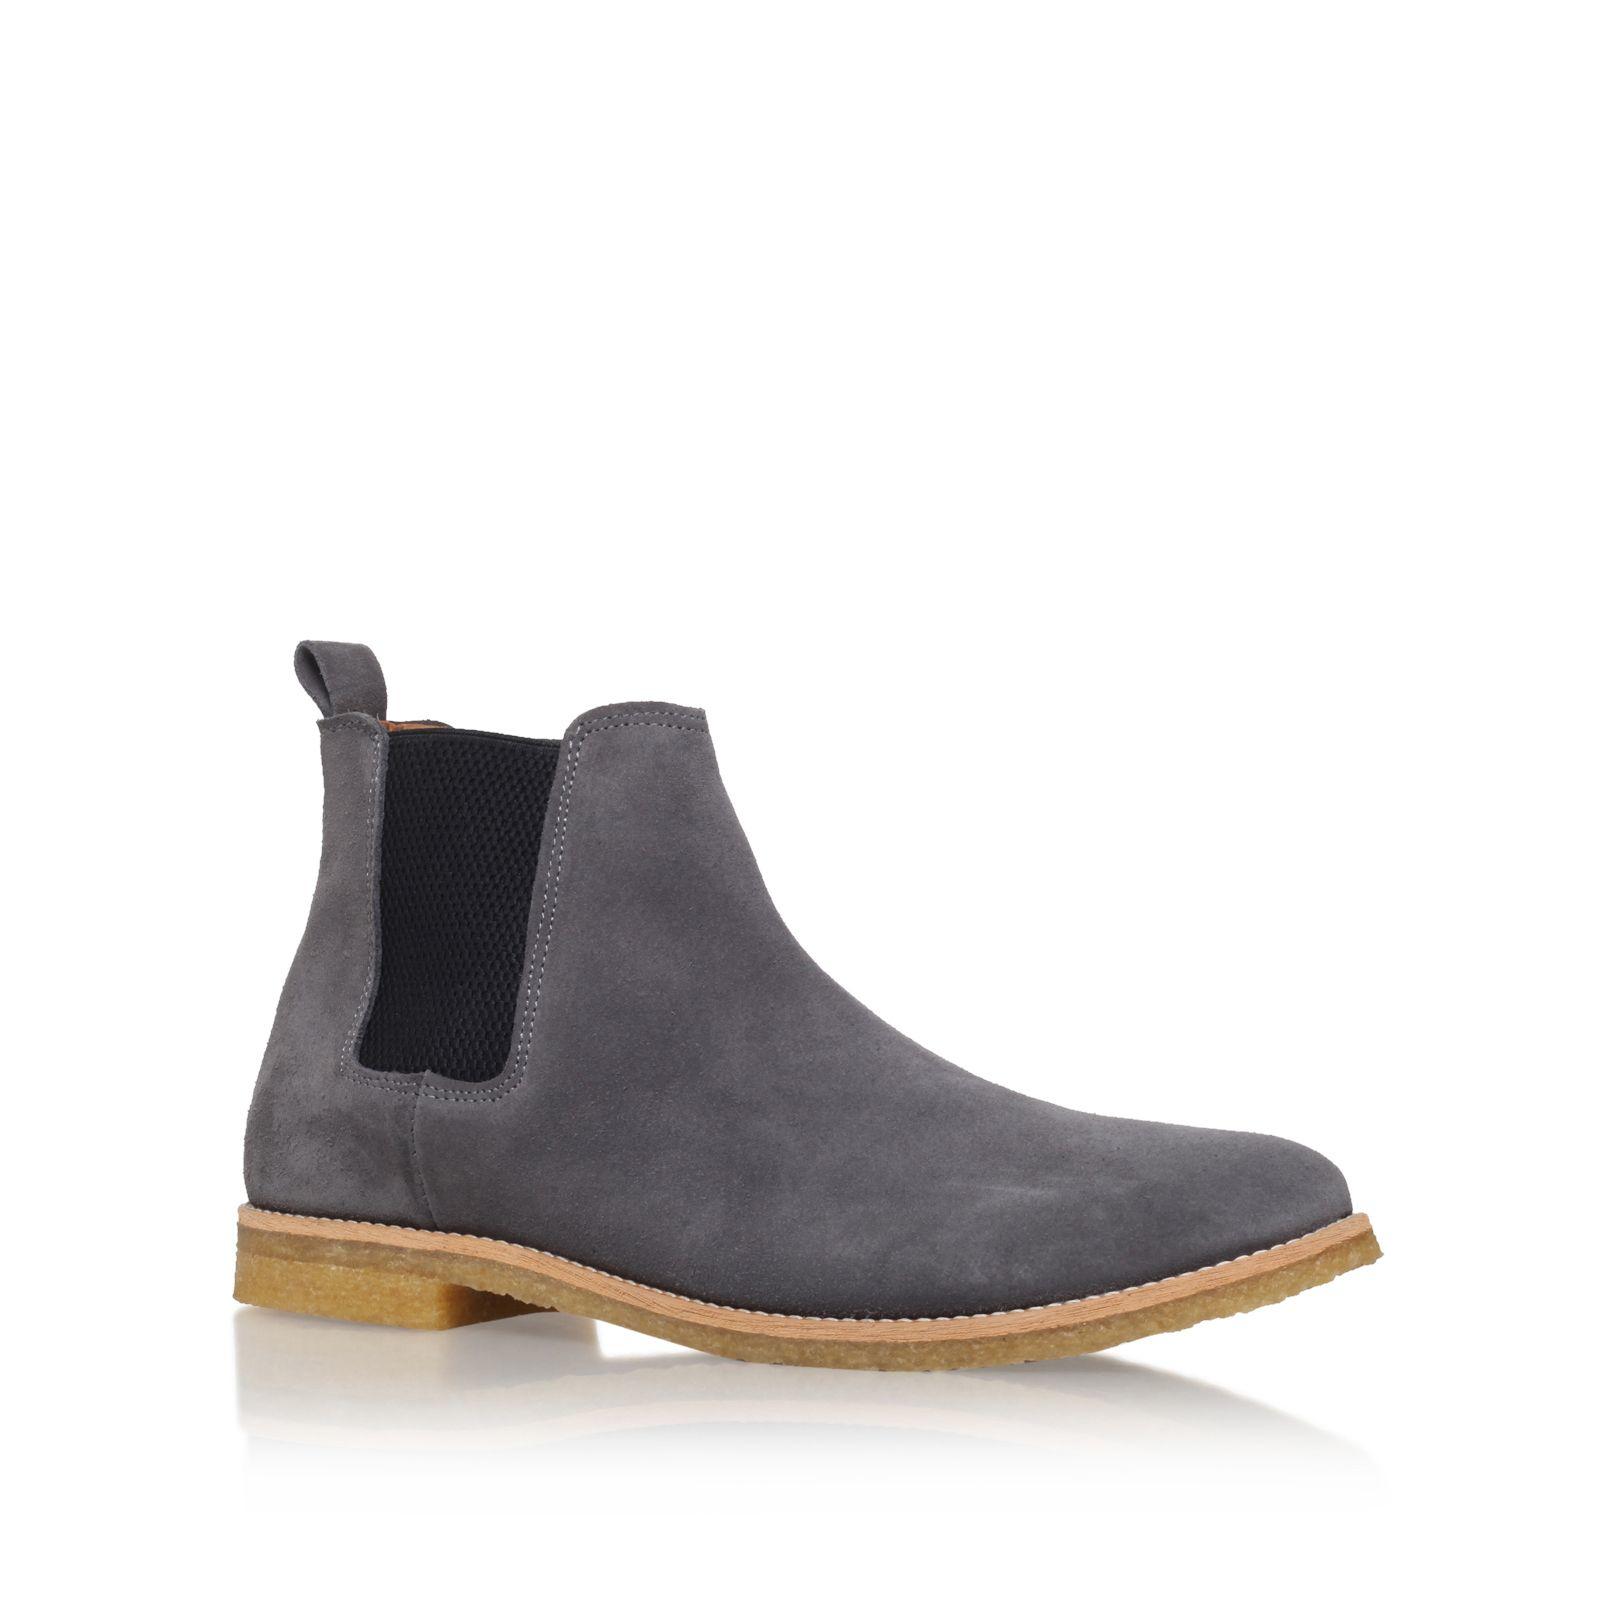 kg by kurt geiger reggie chelsea boots in gray for men lyst. Black Bedroom Furniture Sets. Home Design Ideas